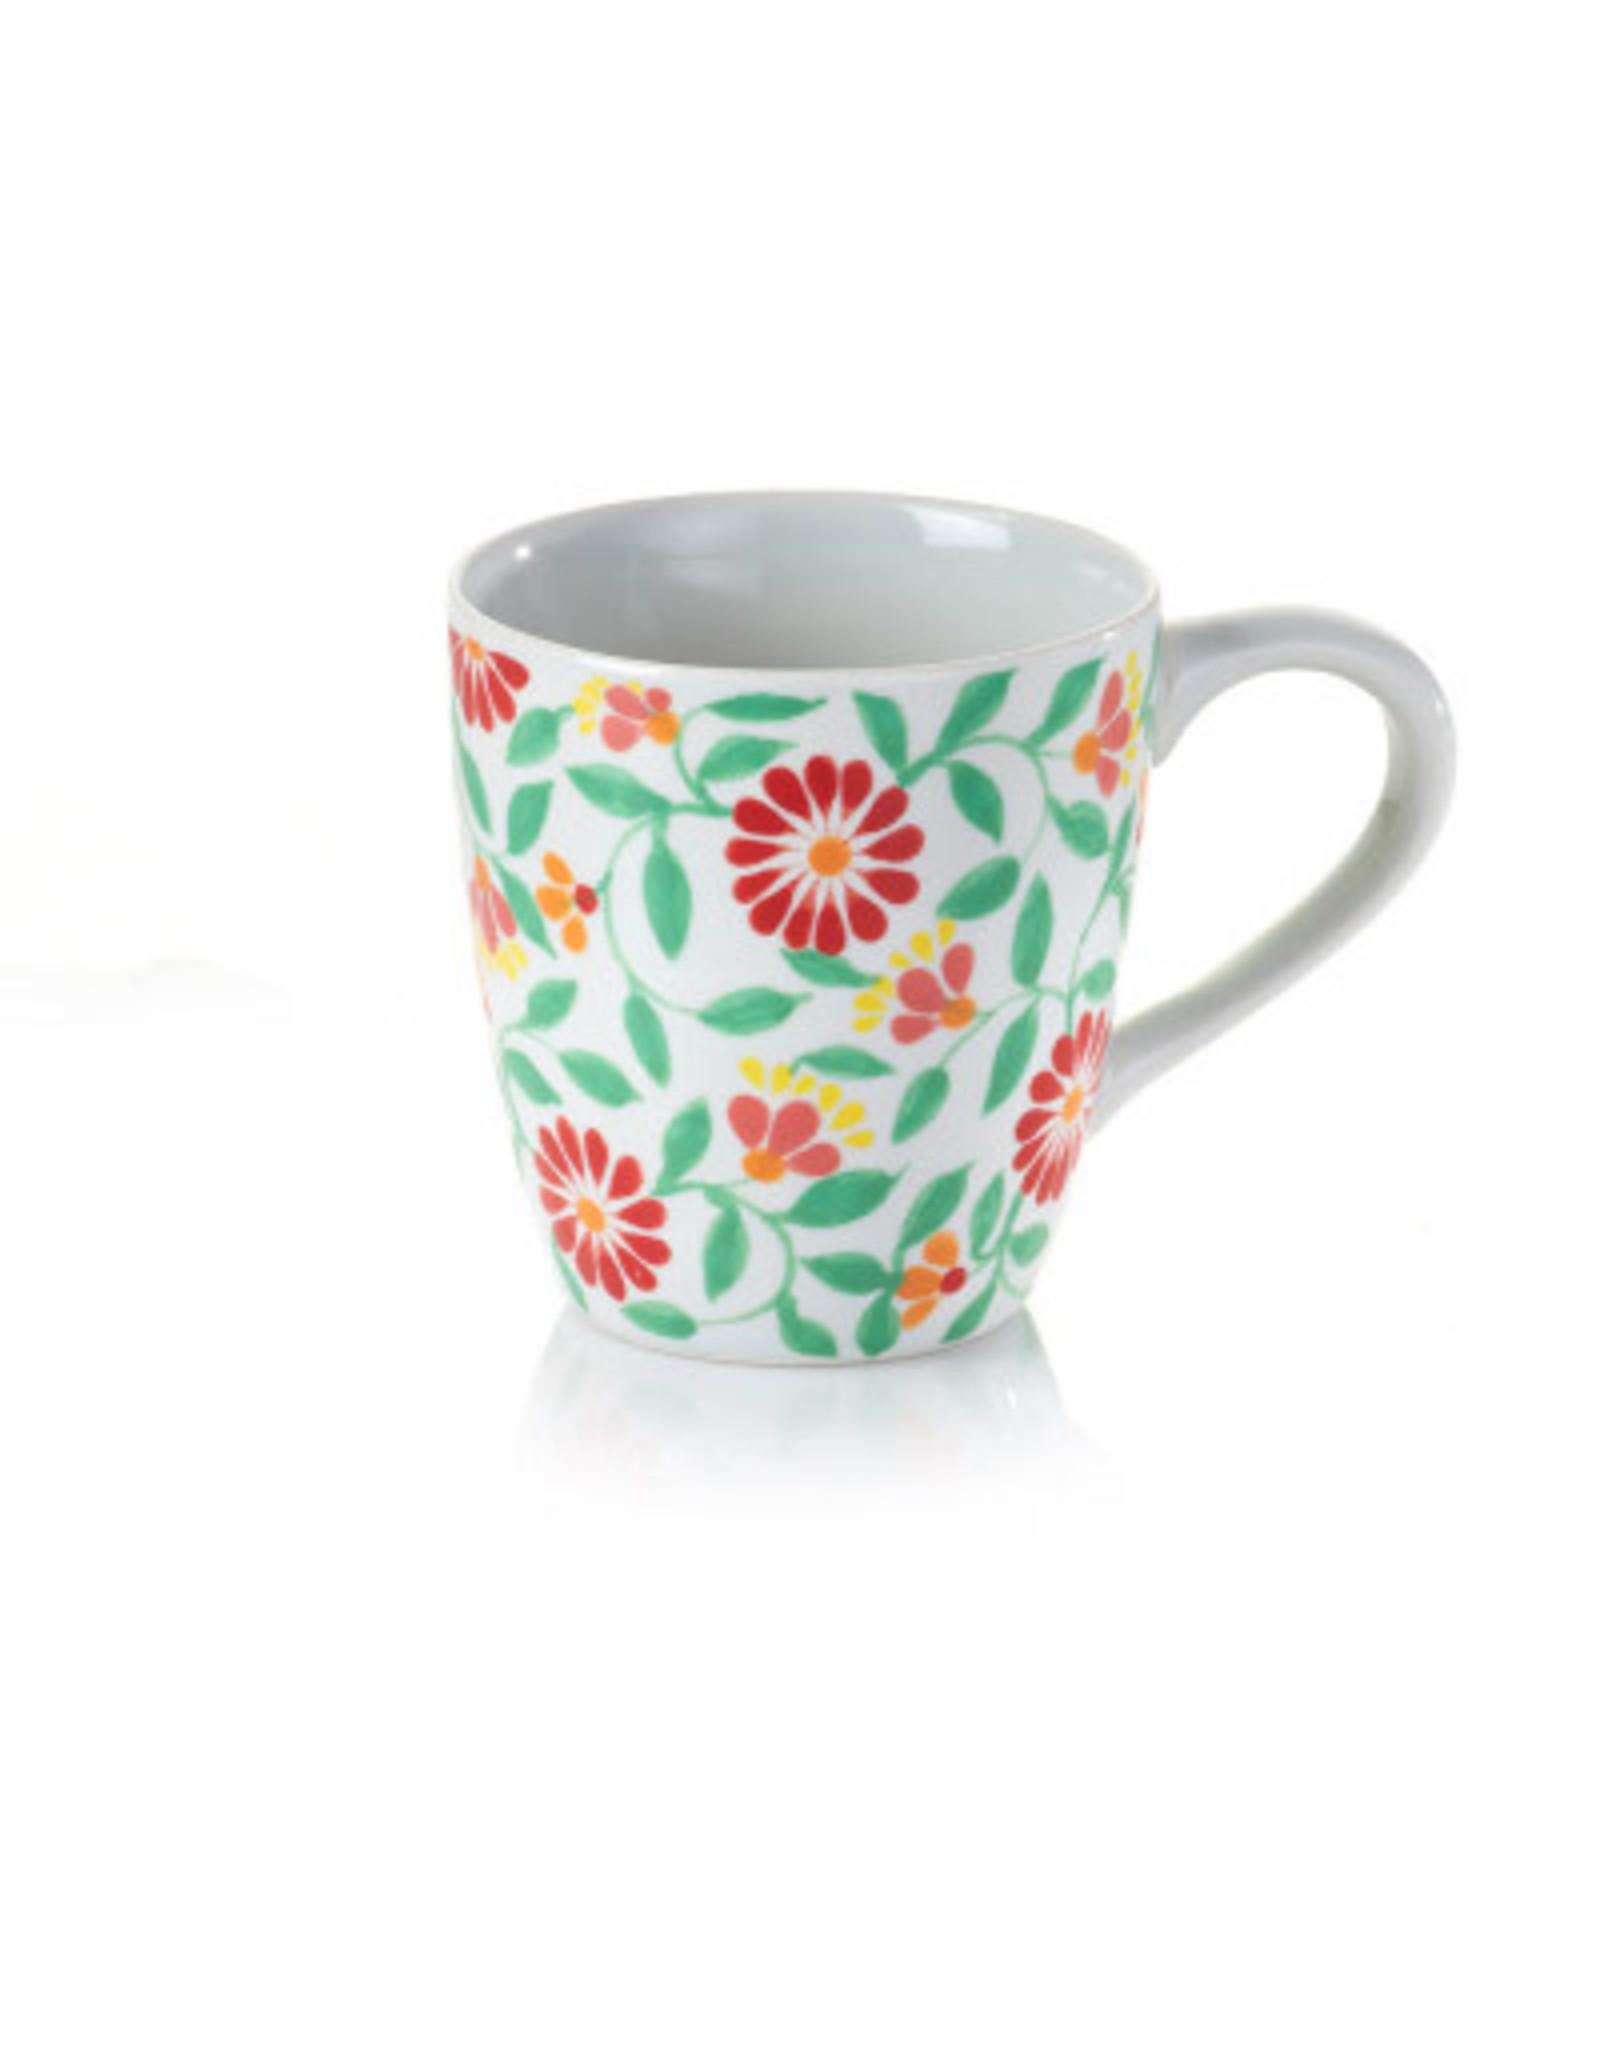 Sang Hoa Ceramic Mug, Vietnam